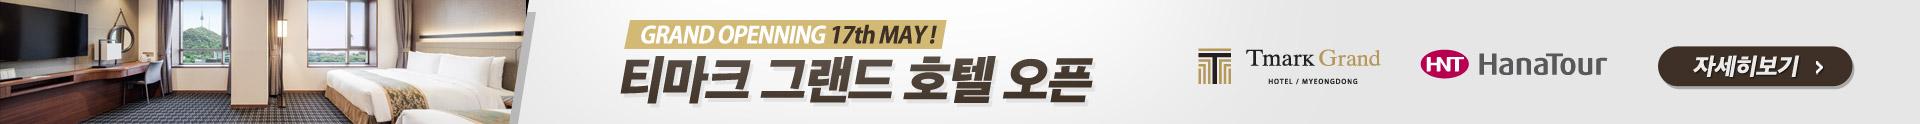 New KITA_HanaTour-Promotion_Banner